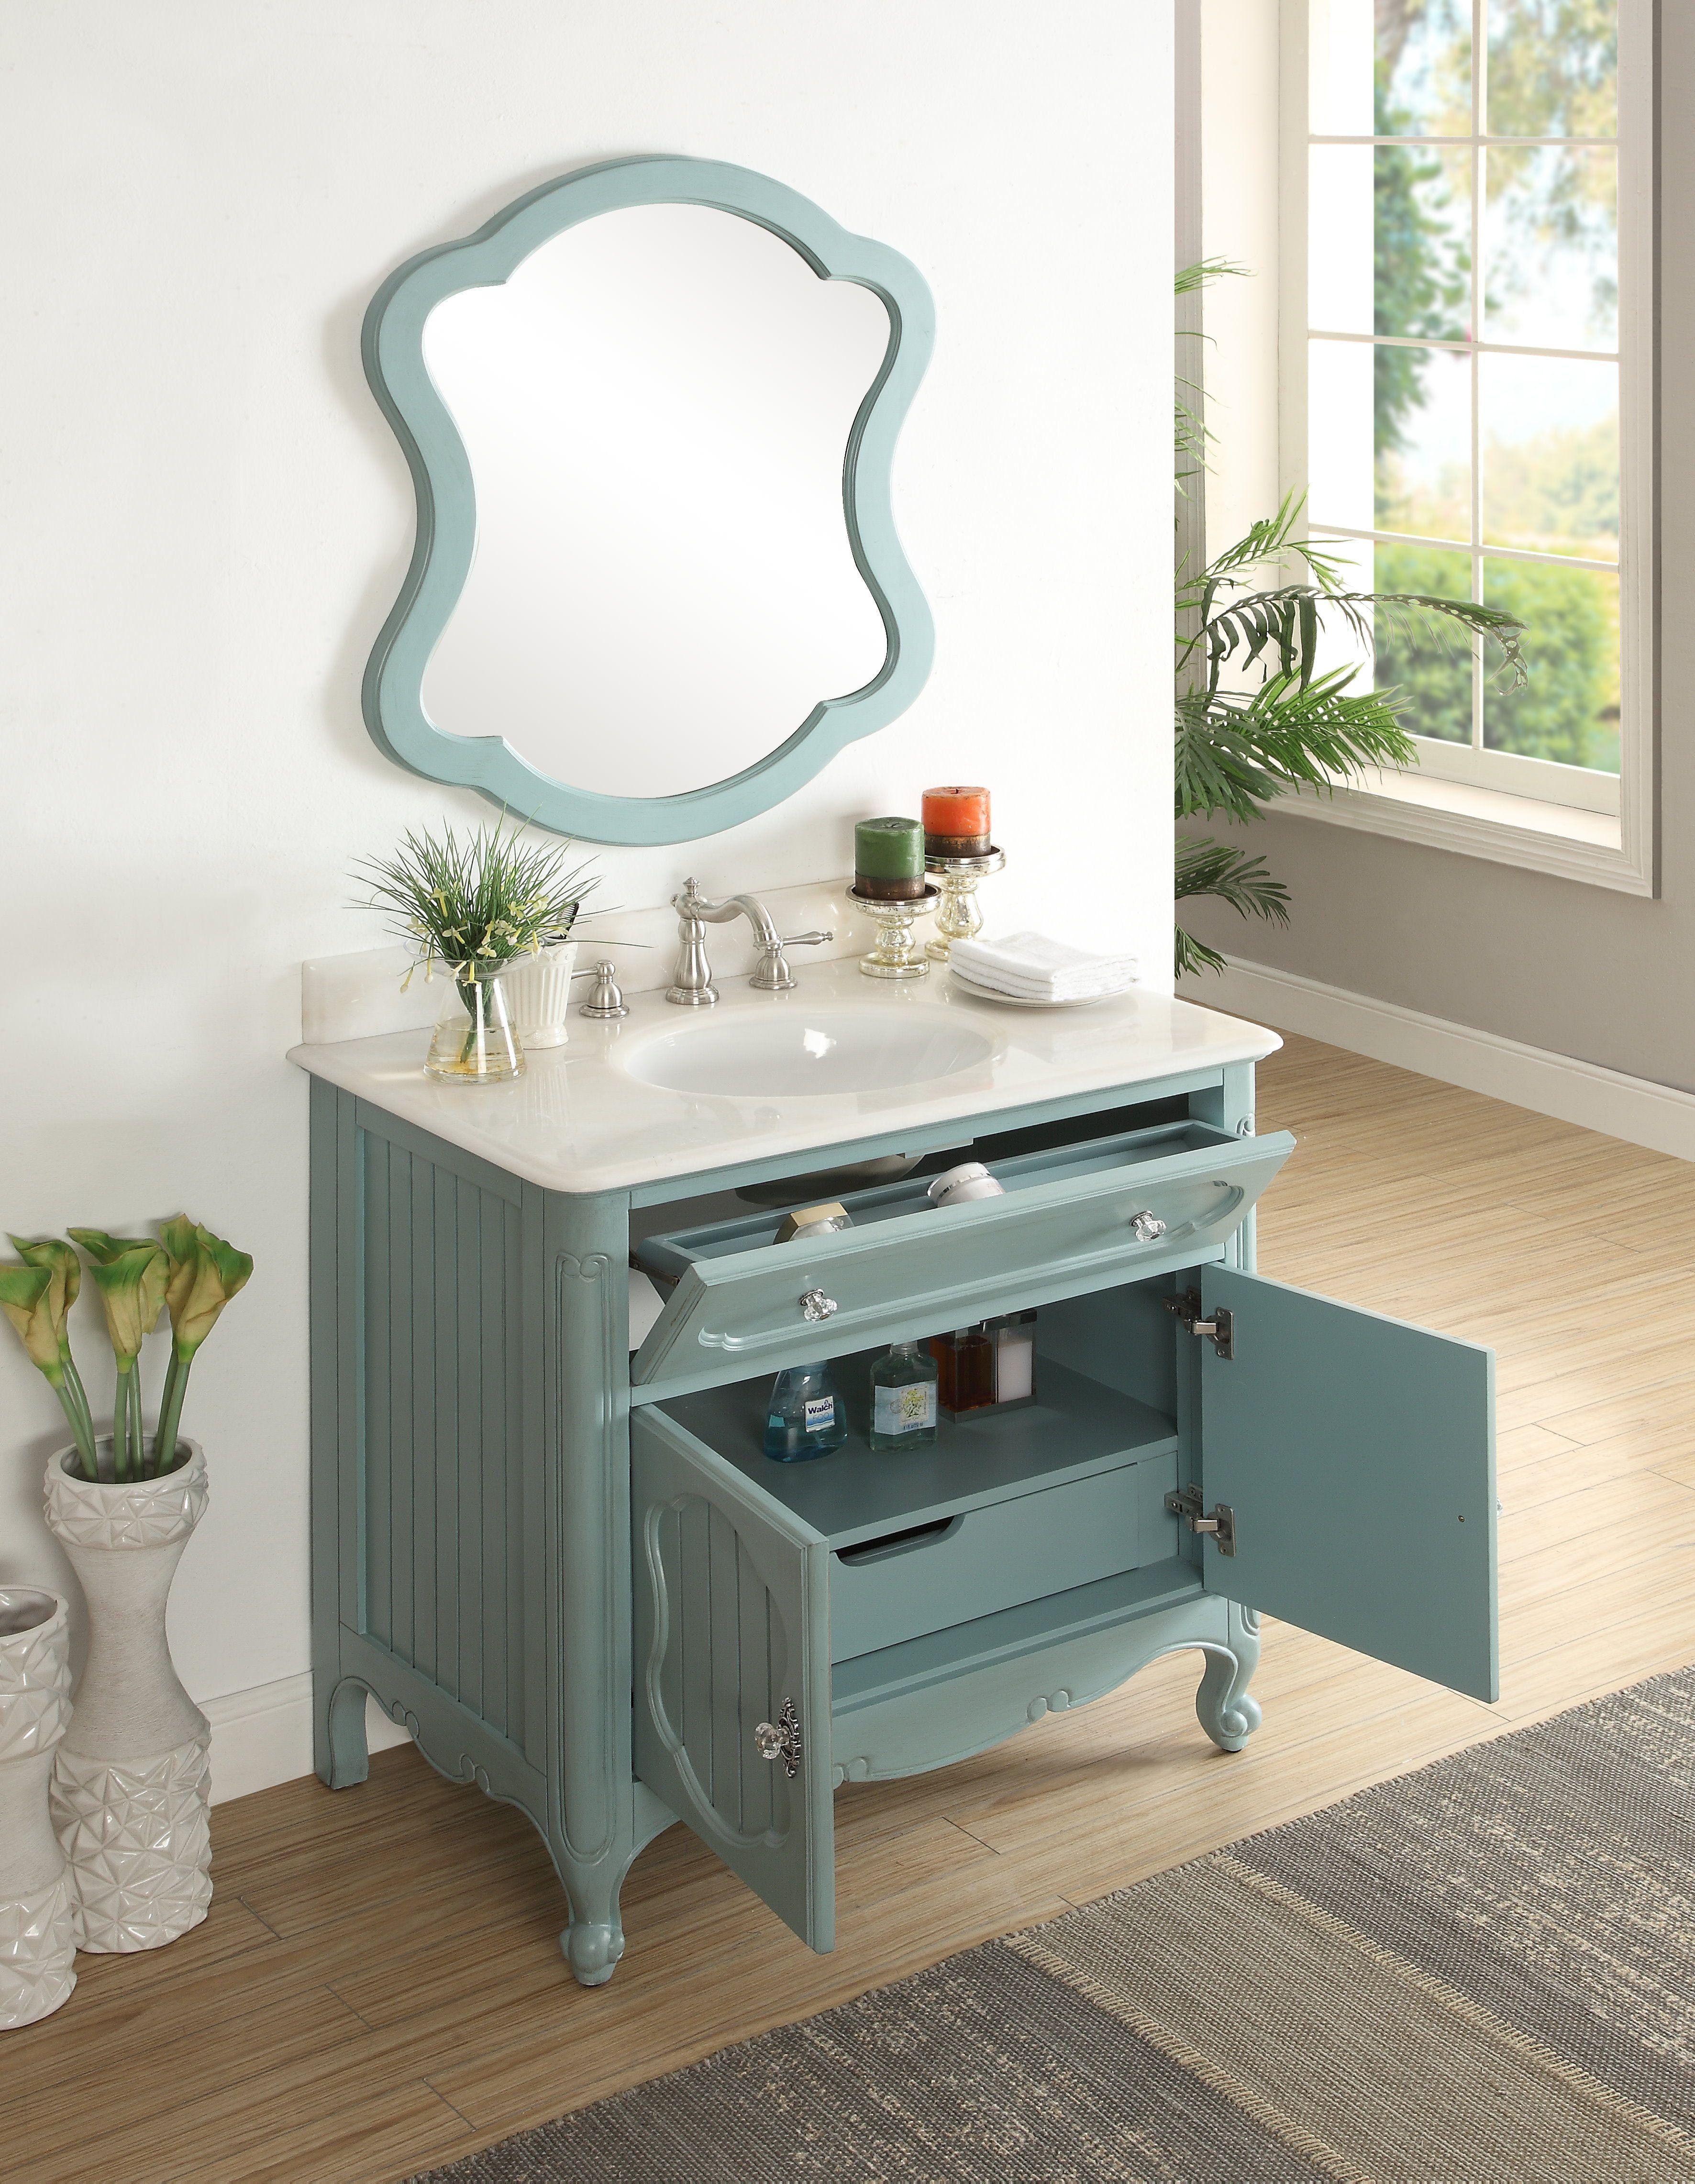 34 Benton Collection Victorian Cottage Style Knoxville Bathroom Vanity With Mirror Gd 1533bu Mir Shabby Chic Bathroom Bathroom Sink Decor Small Bathroom Decor [ 4565 x 3543 Pixel ]